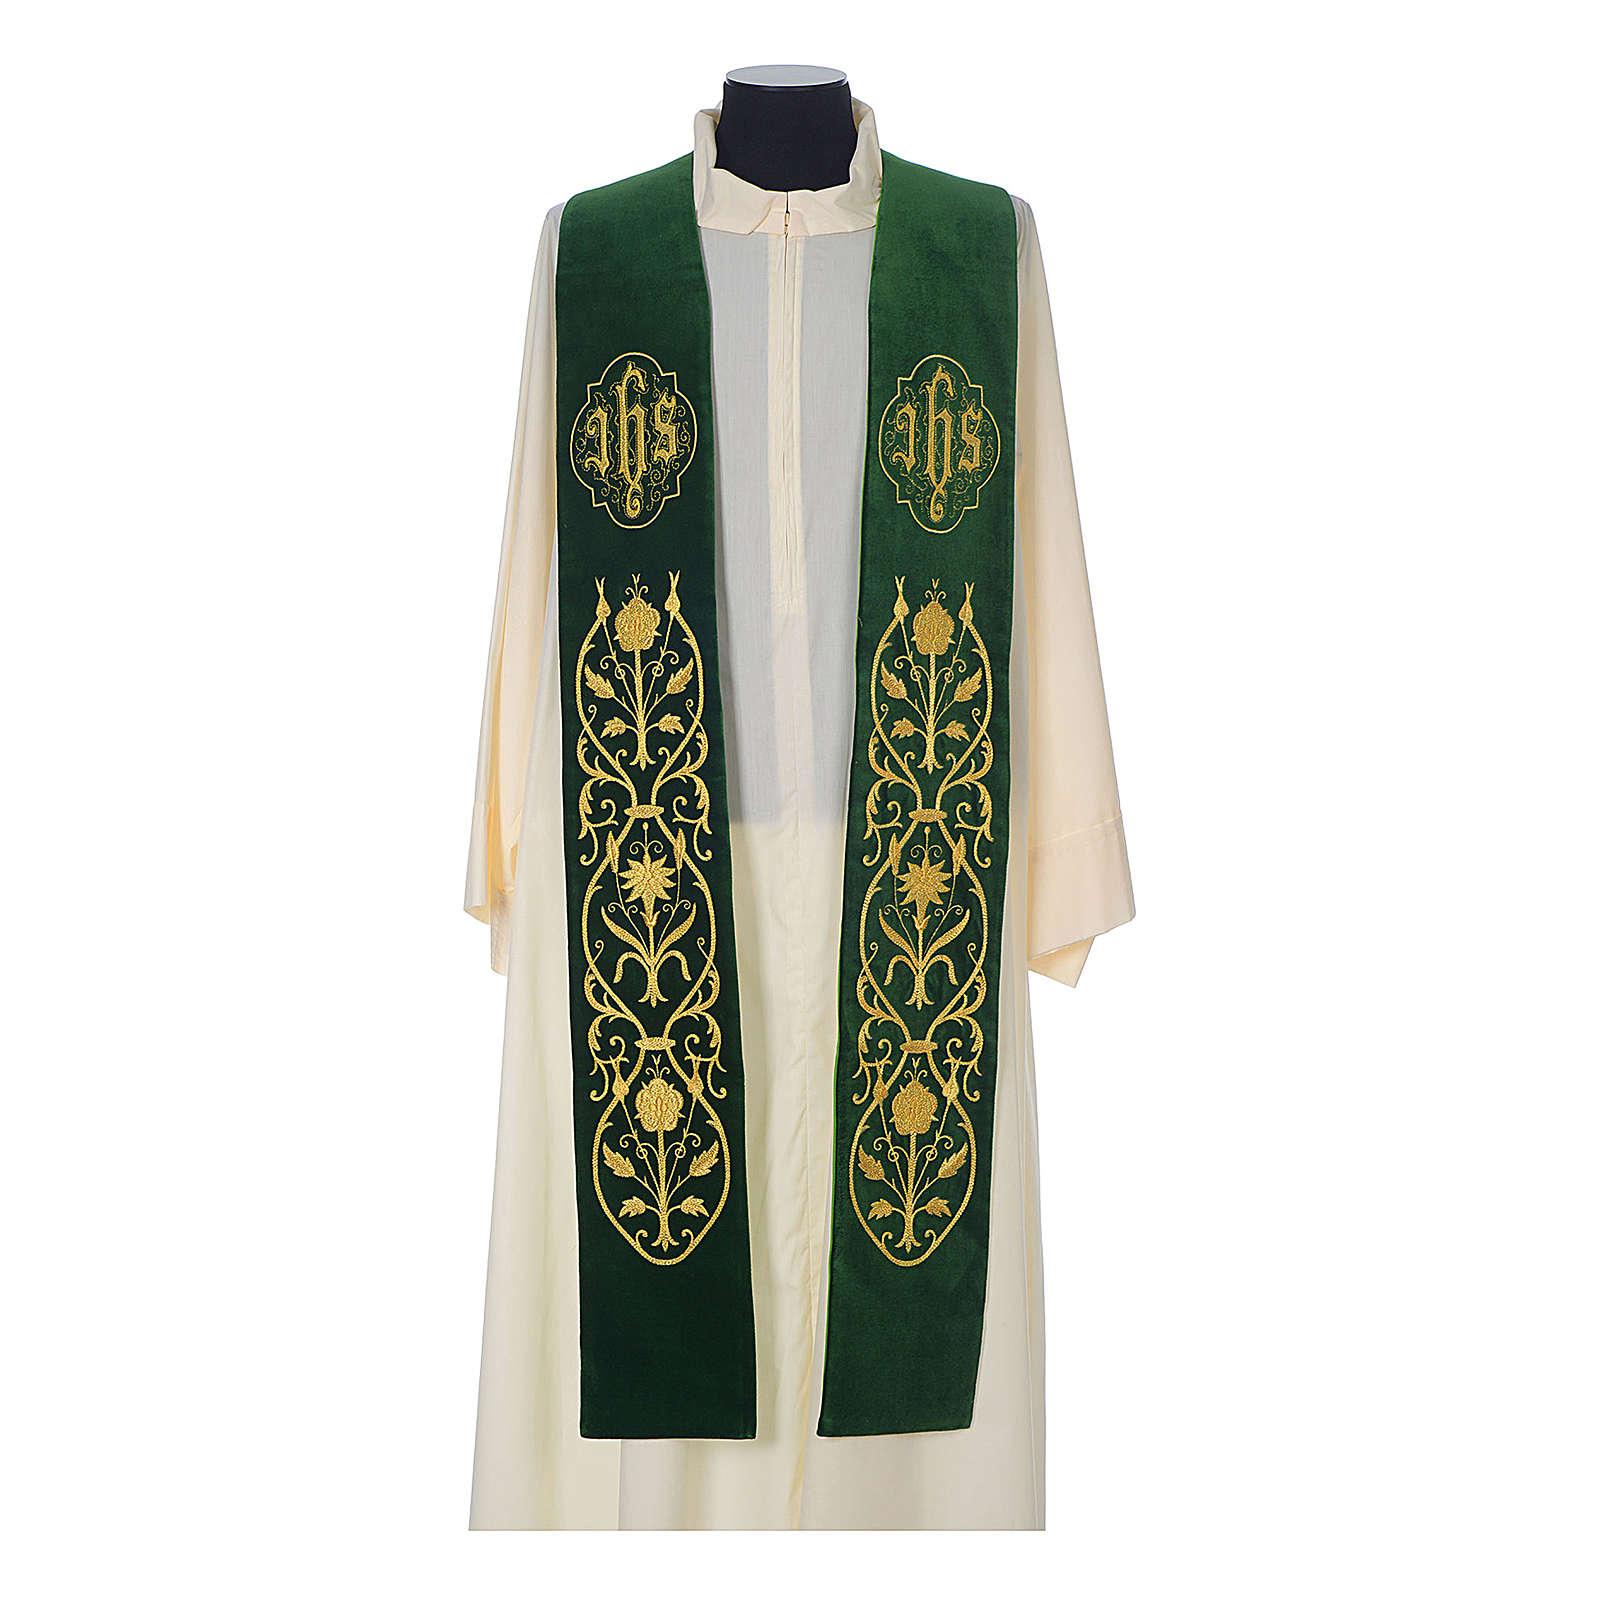 IHS velvet priest stole 4